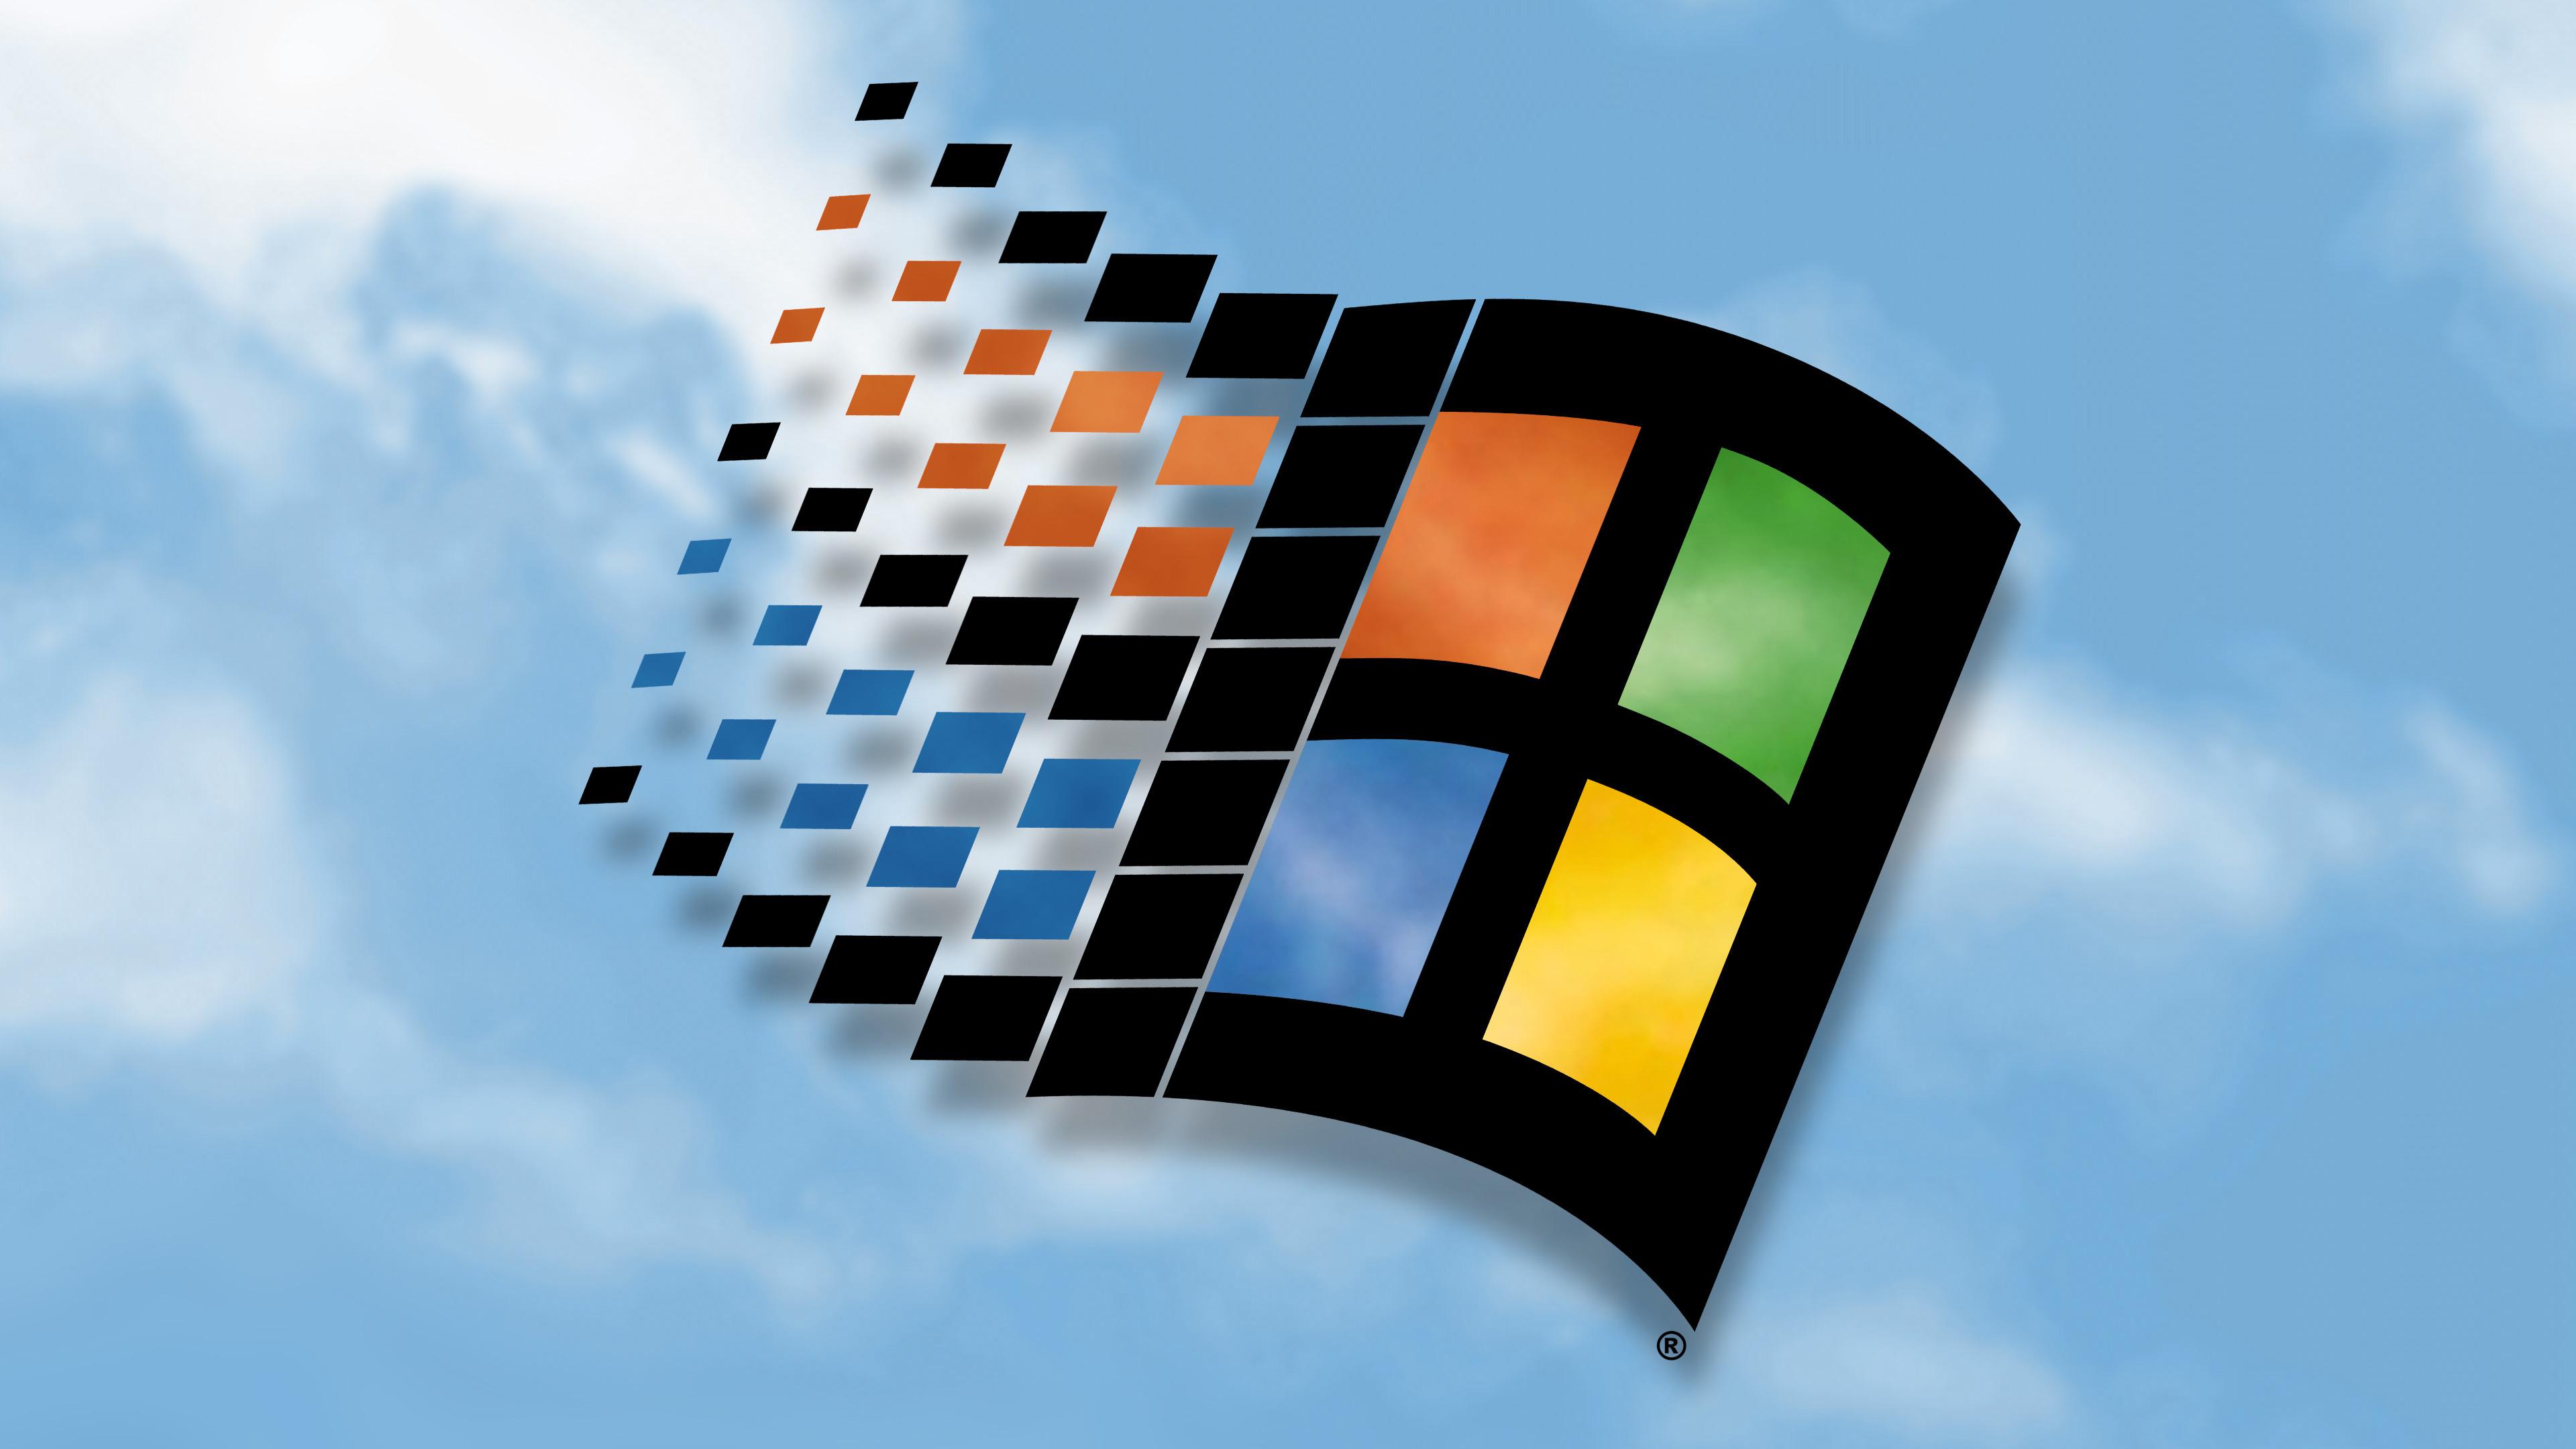 3840x2160 Windows 98 4k 4k HD 4k Wallpapers, Images ...